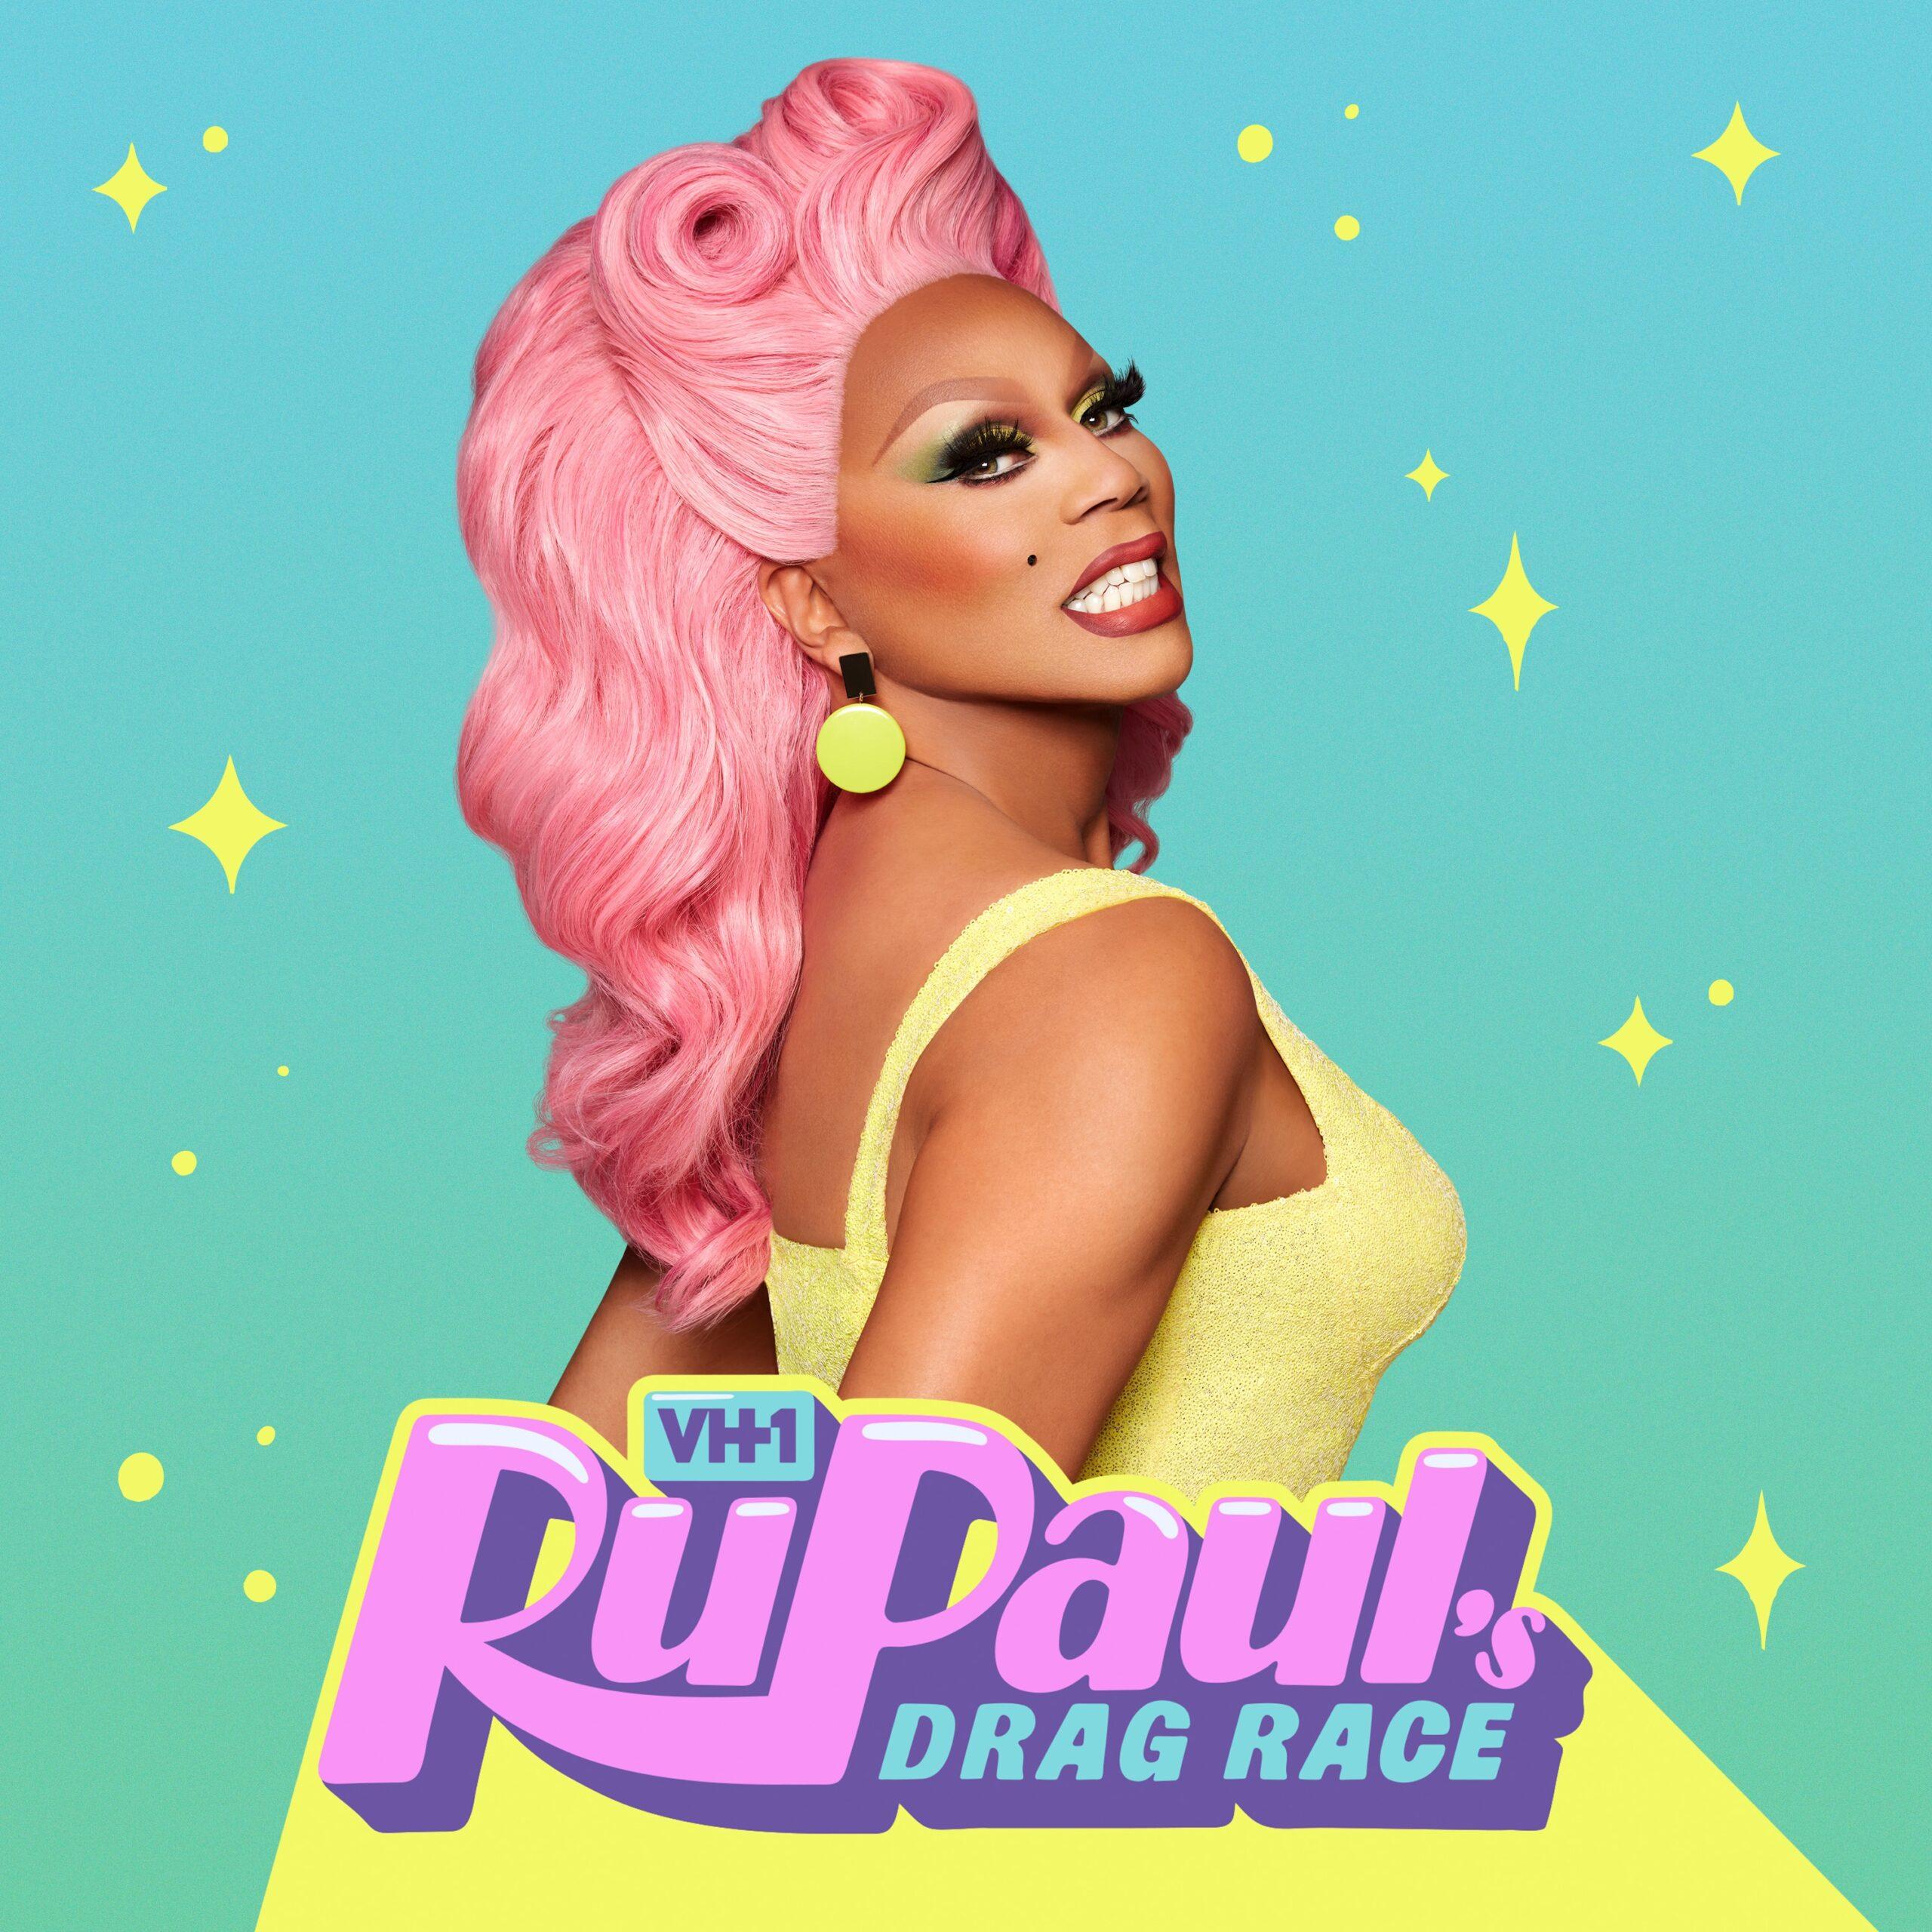 RuPaul Drag Race